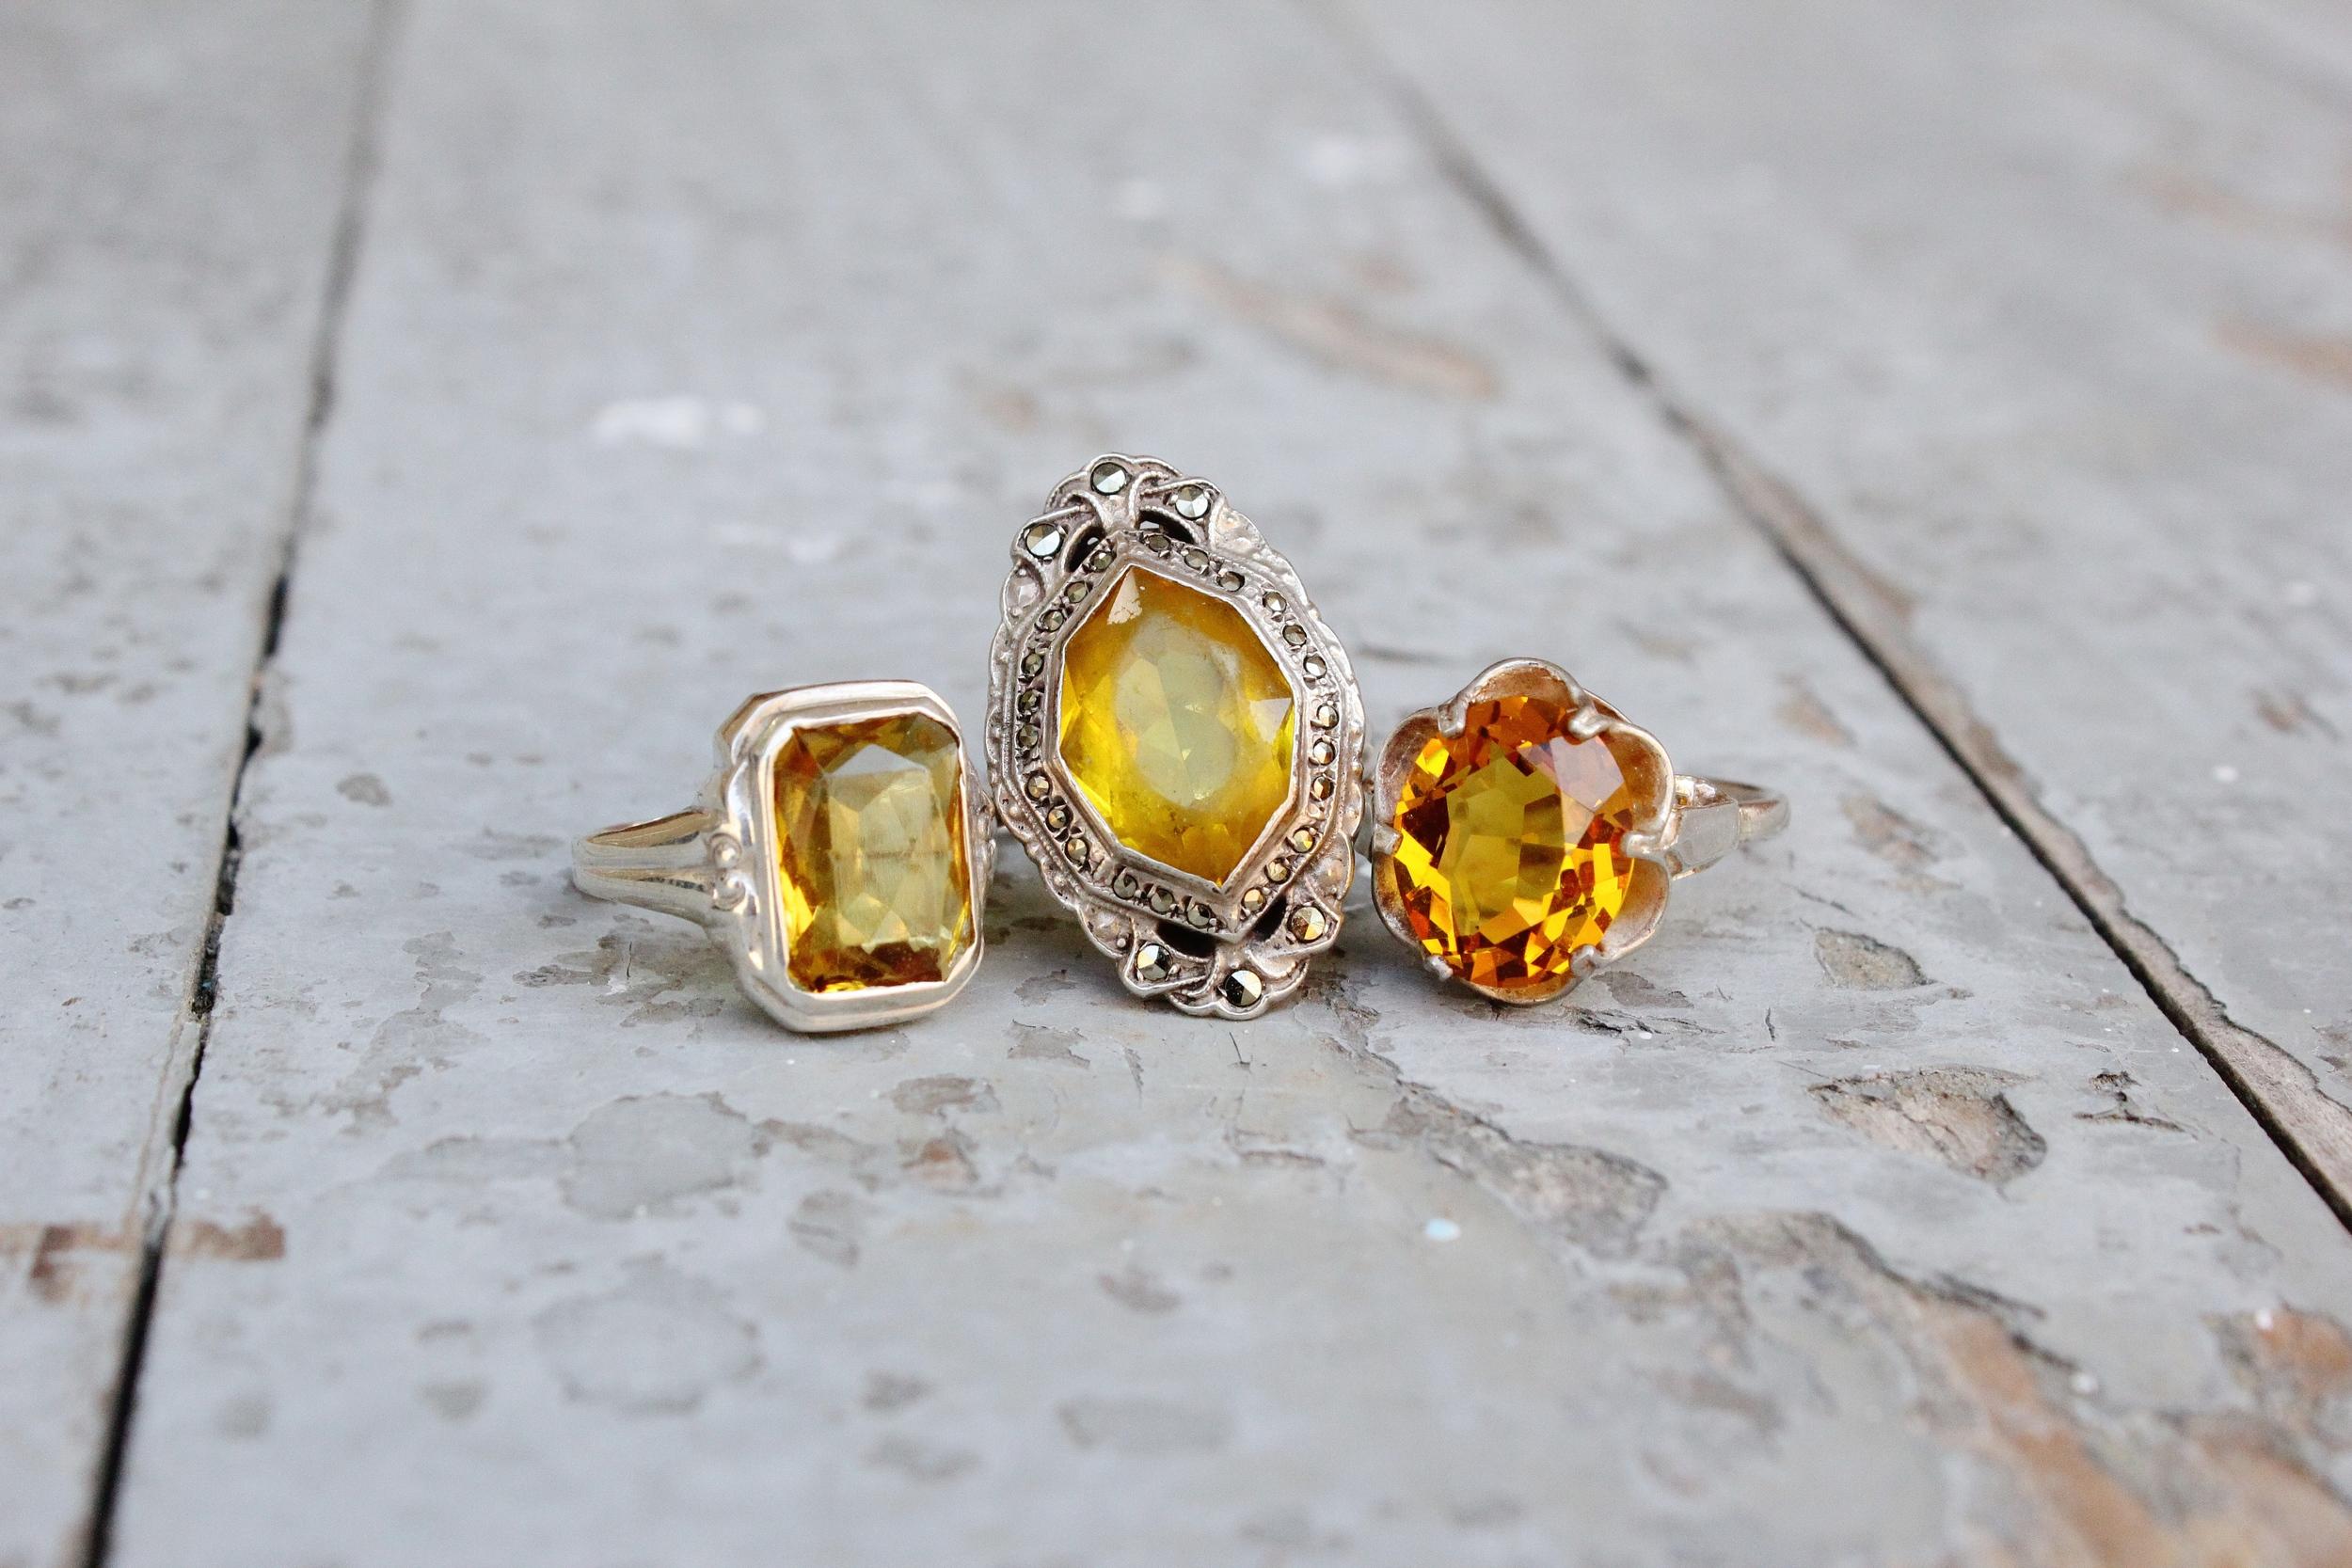 Citrine colored stones